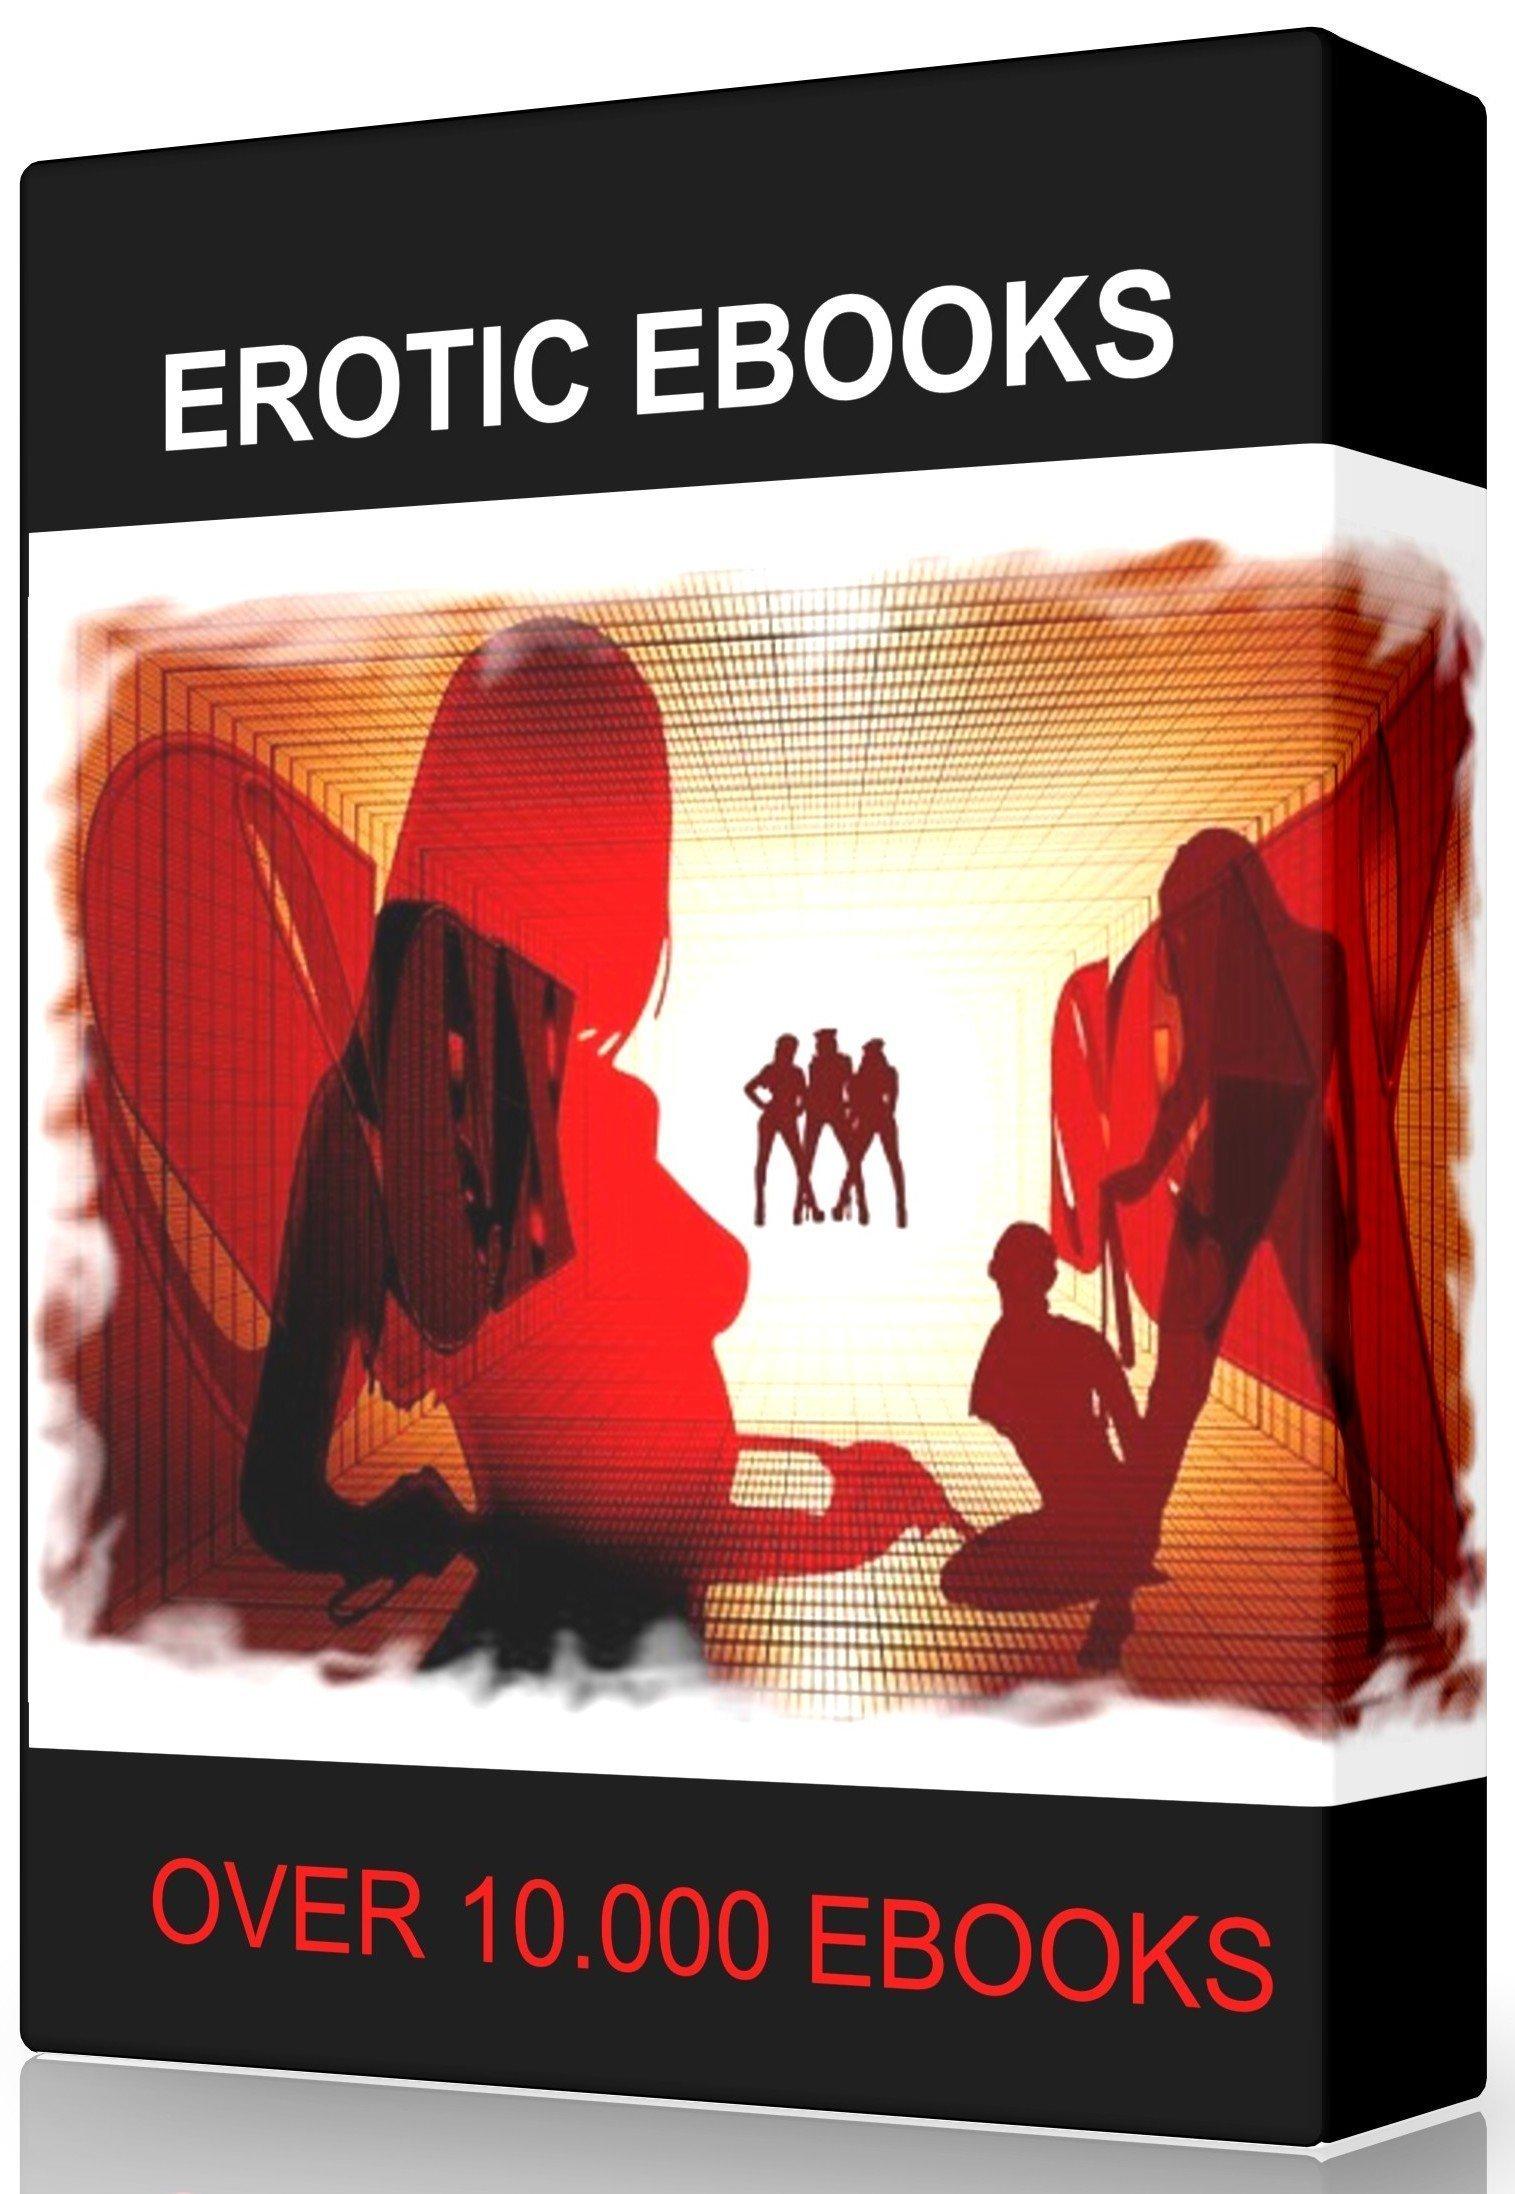 Erotic mobi e books